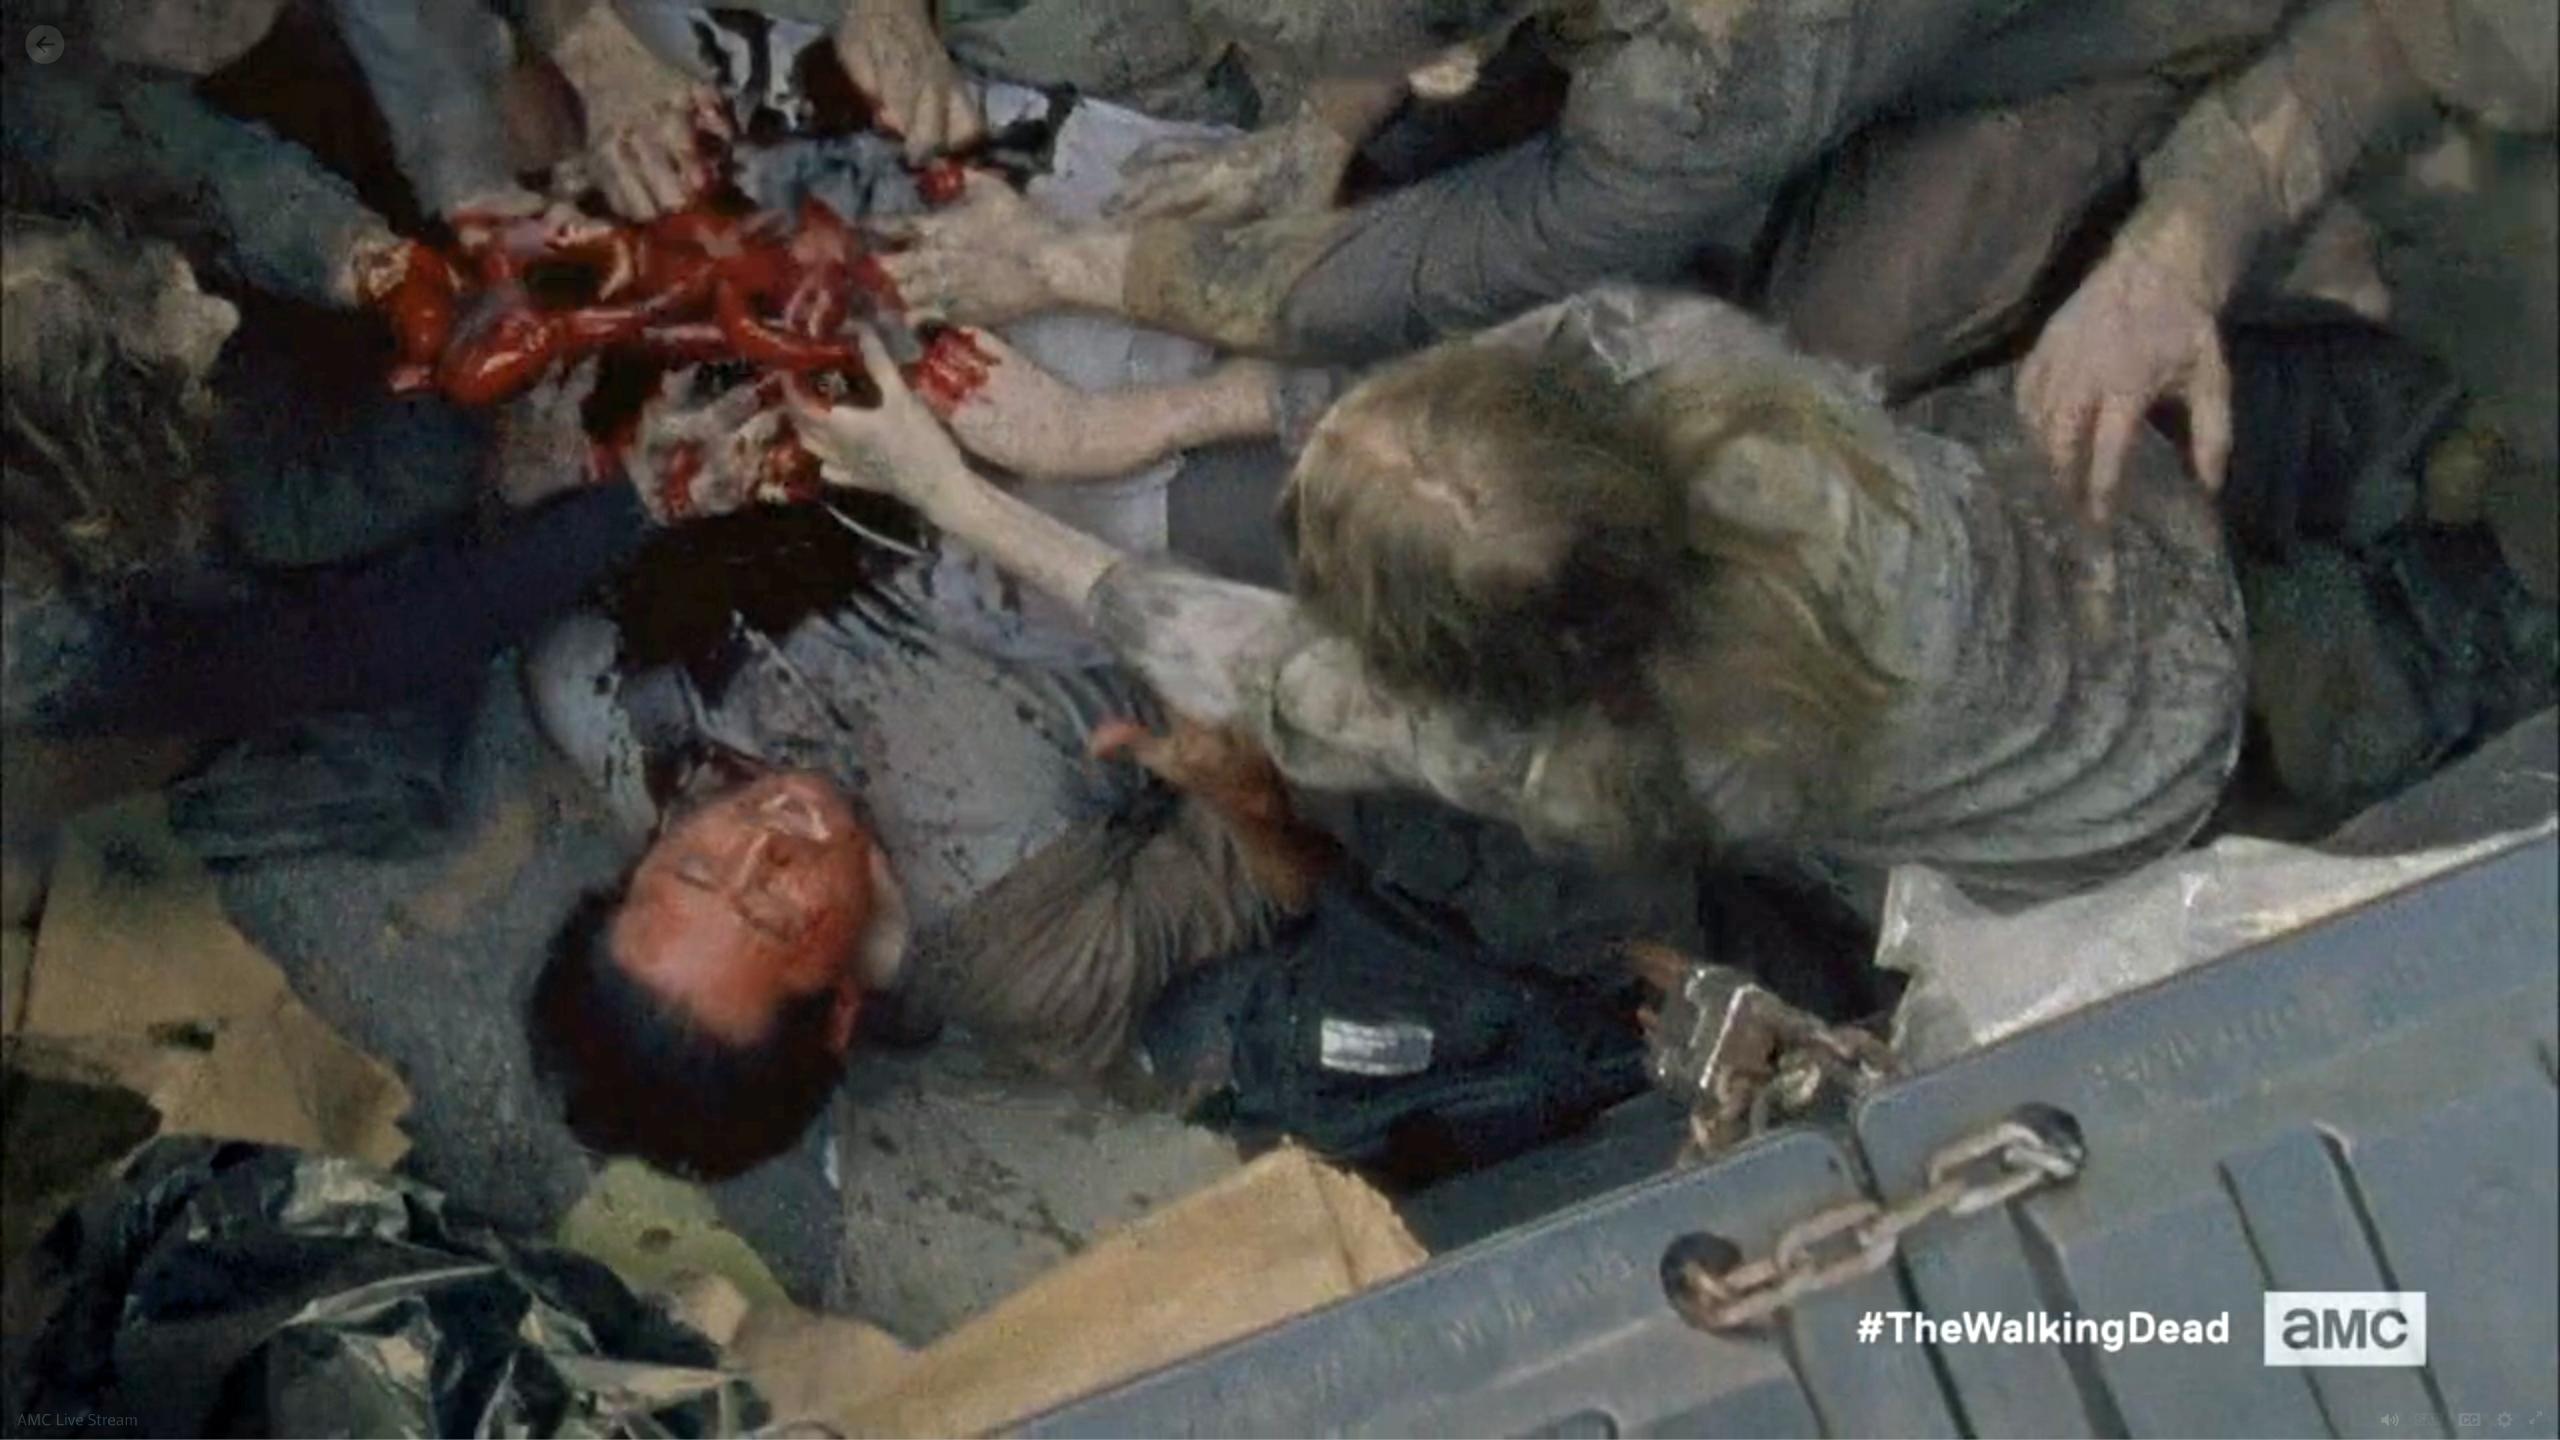 Kravla snabbare, Glenn...